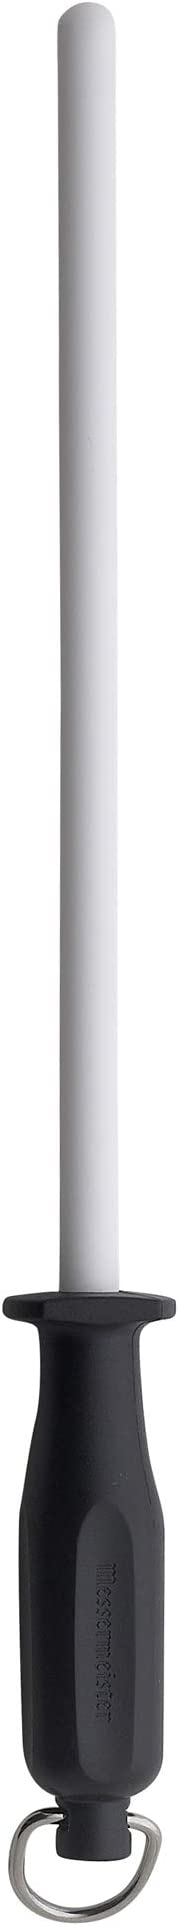 Messermeister Ceramic Rod Knife Sharpener, 12-Inch